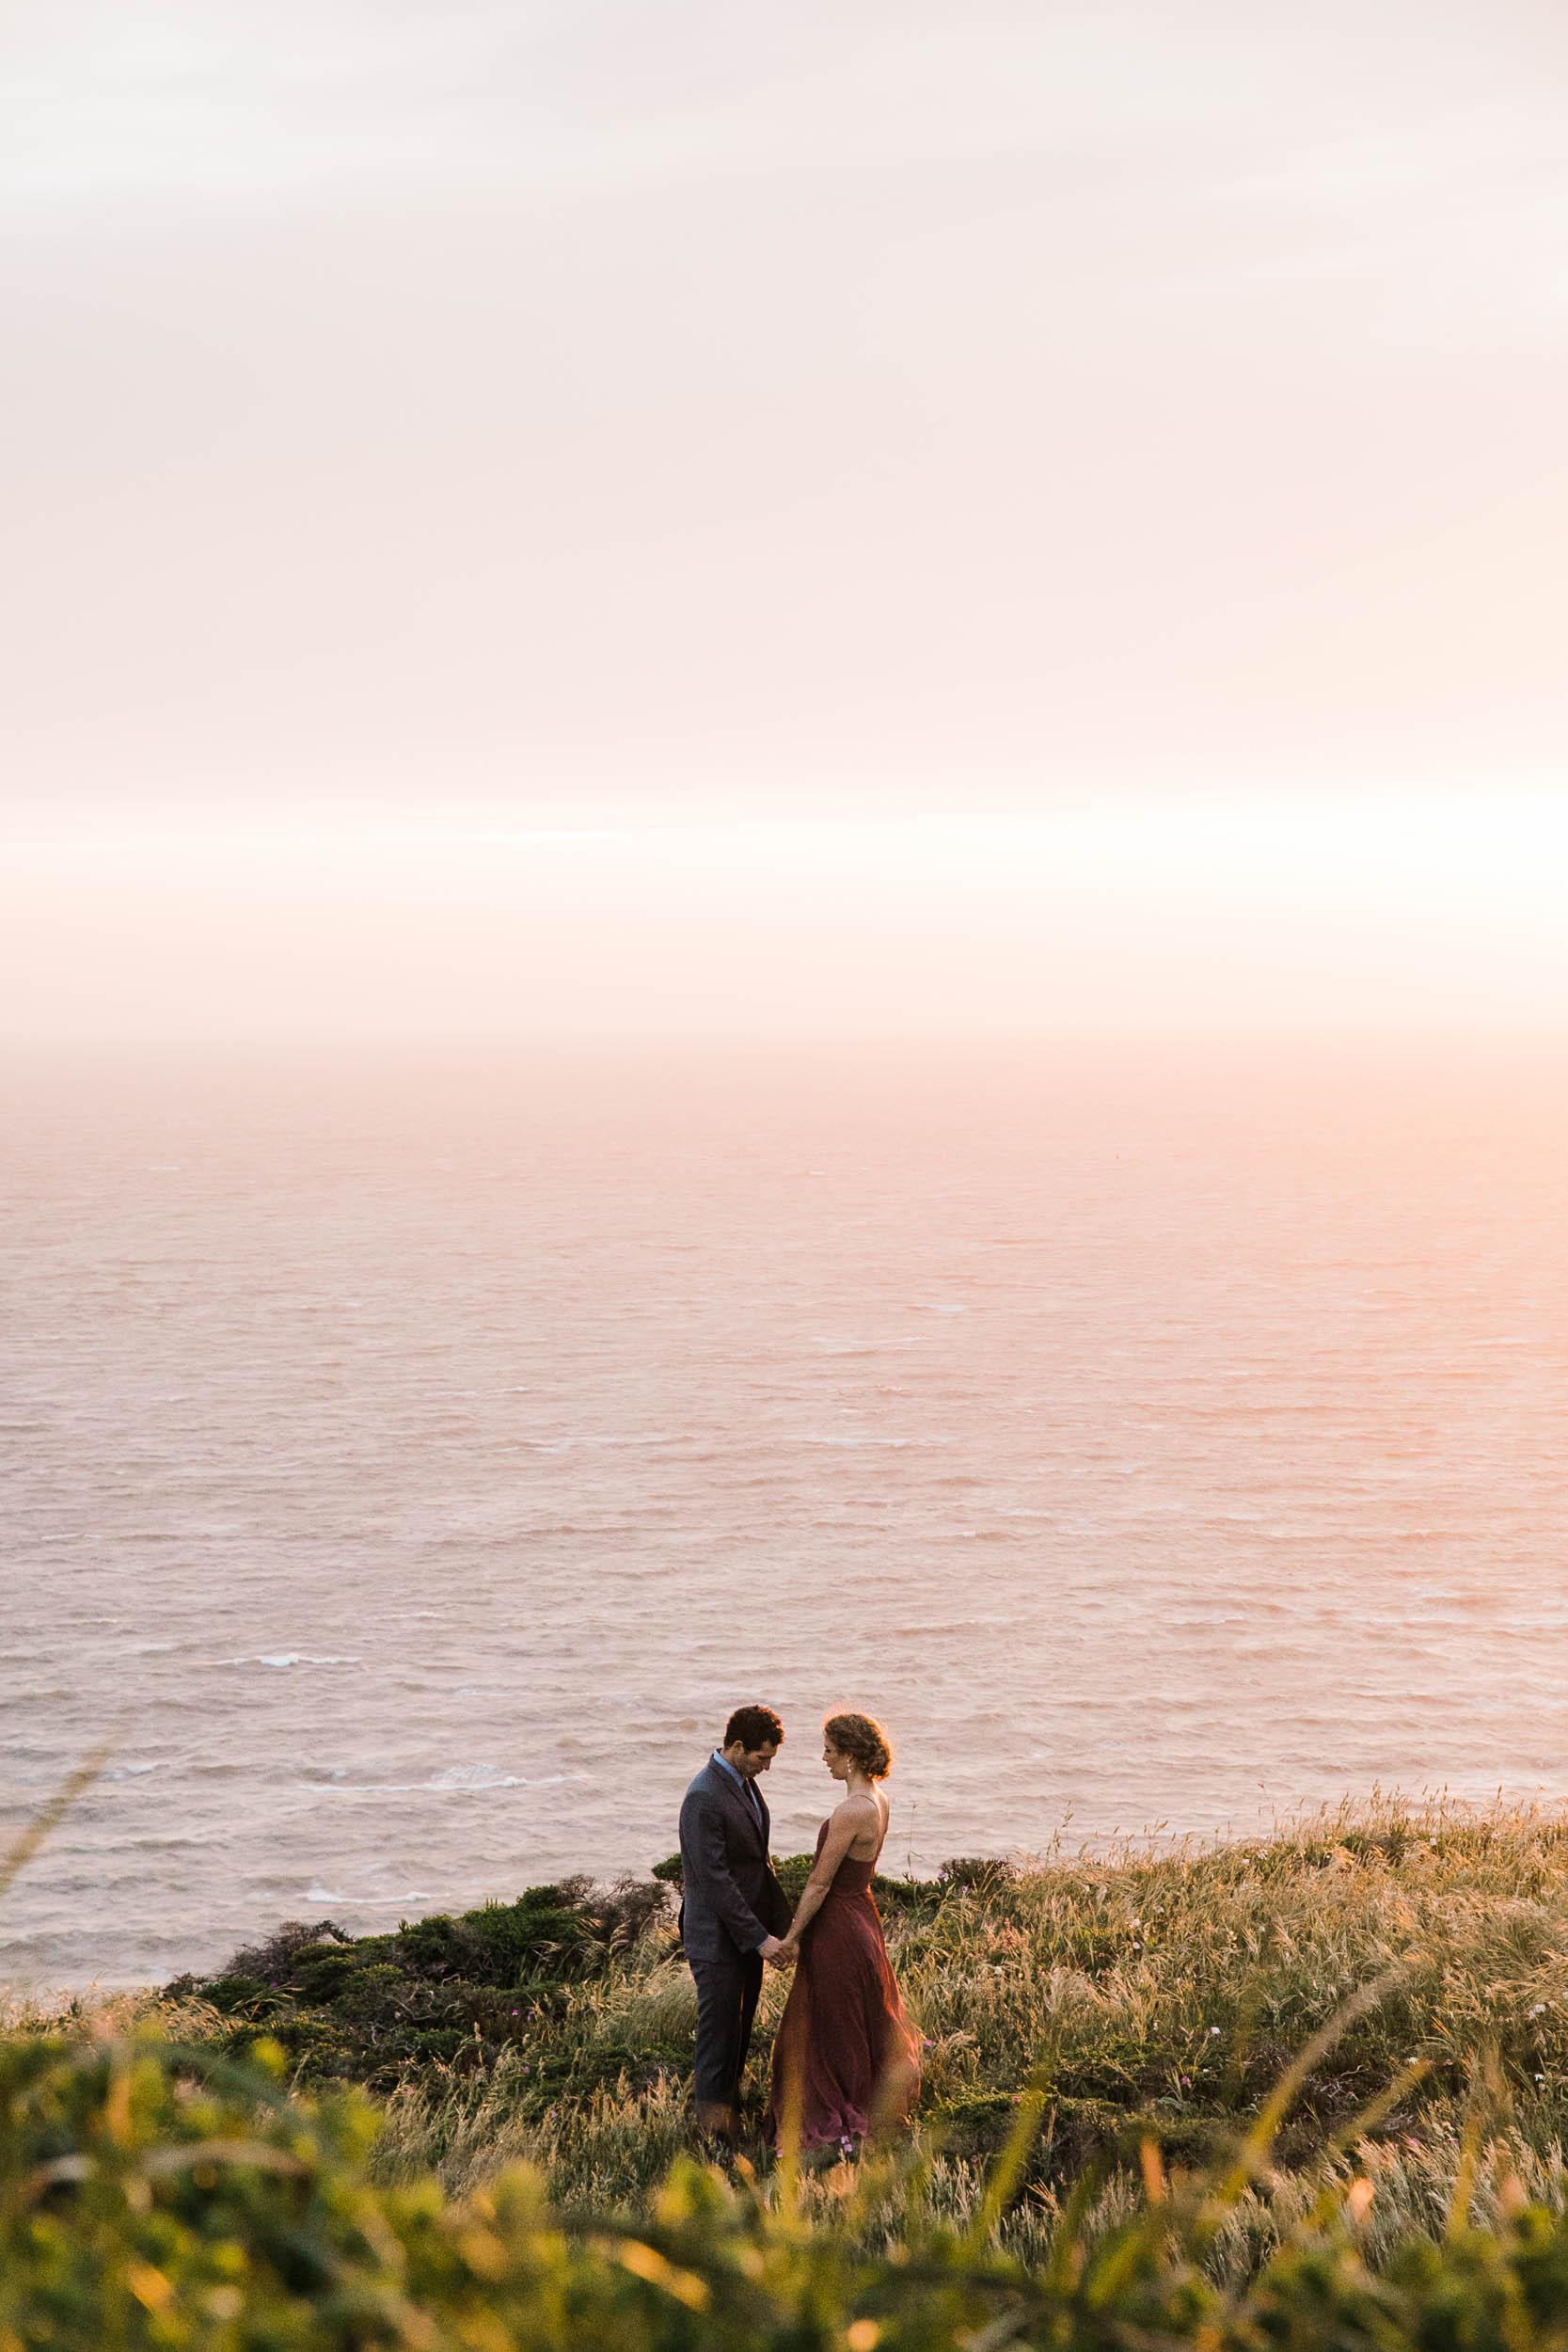 marin headland land sea adventure elopement